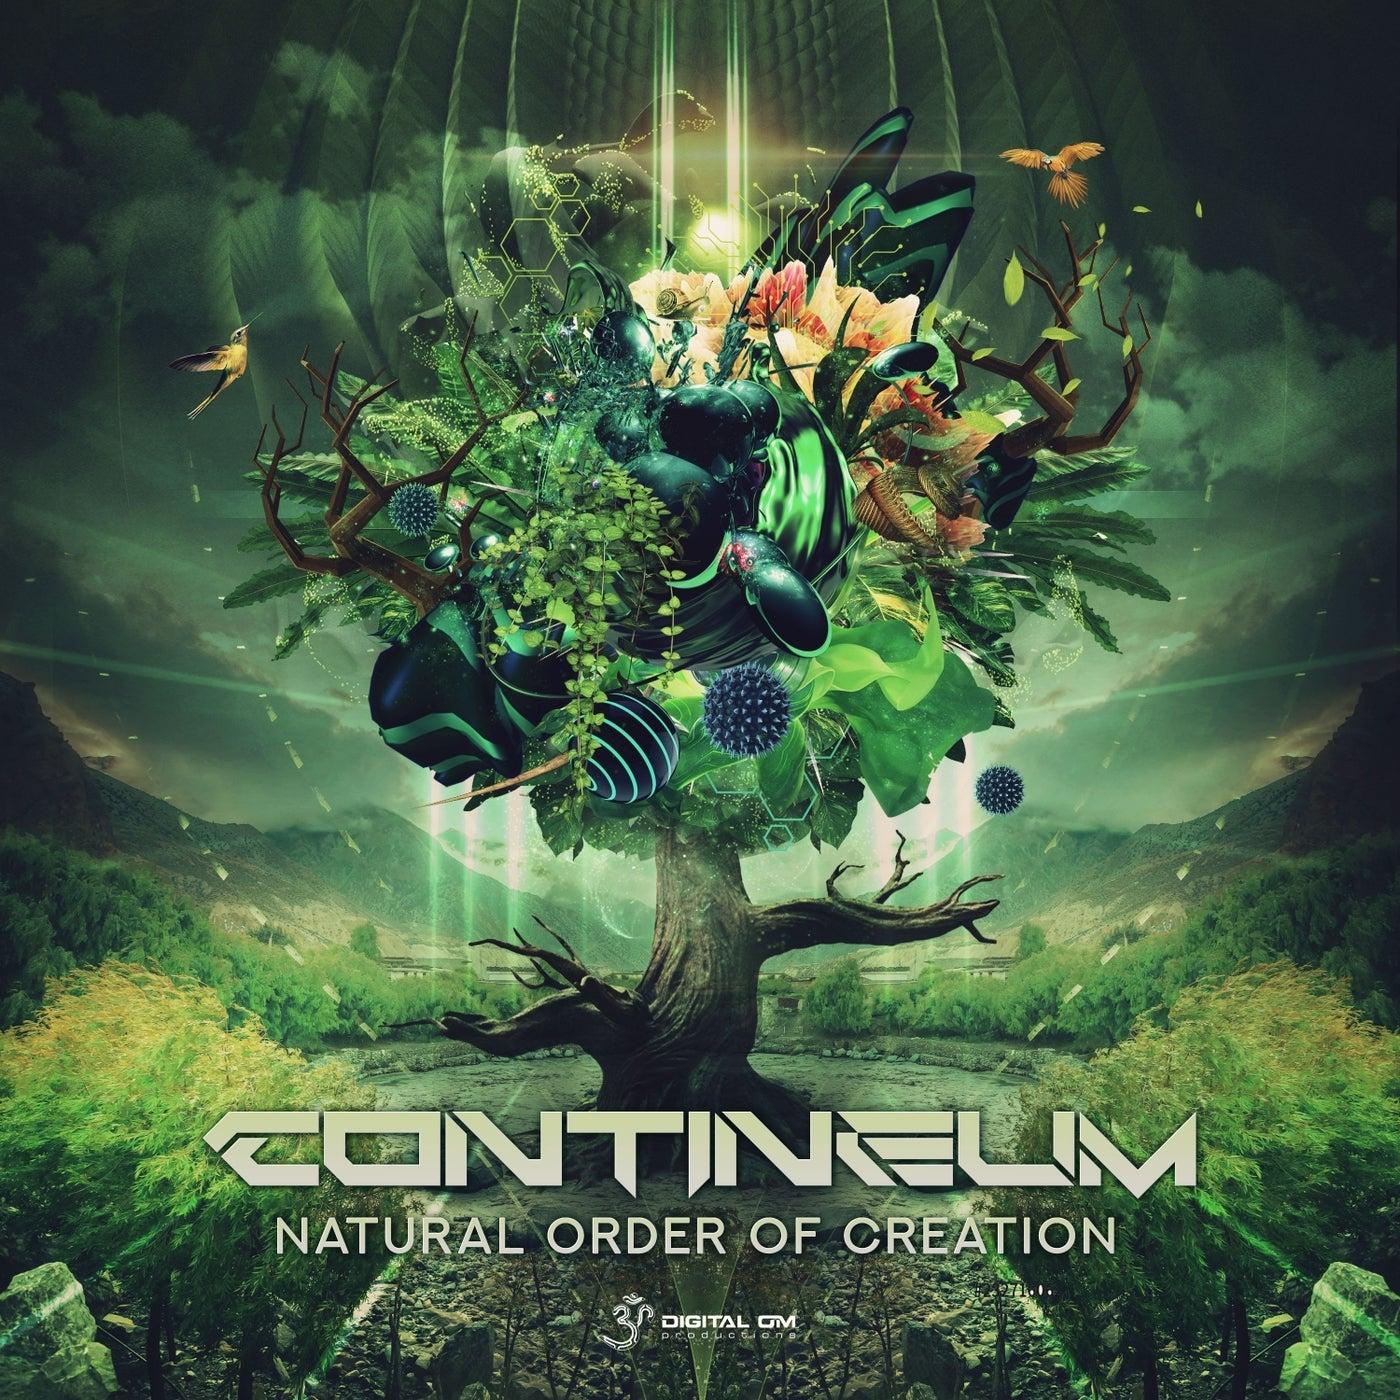 Creation (Original Mix)